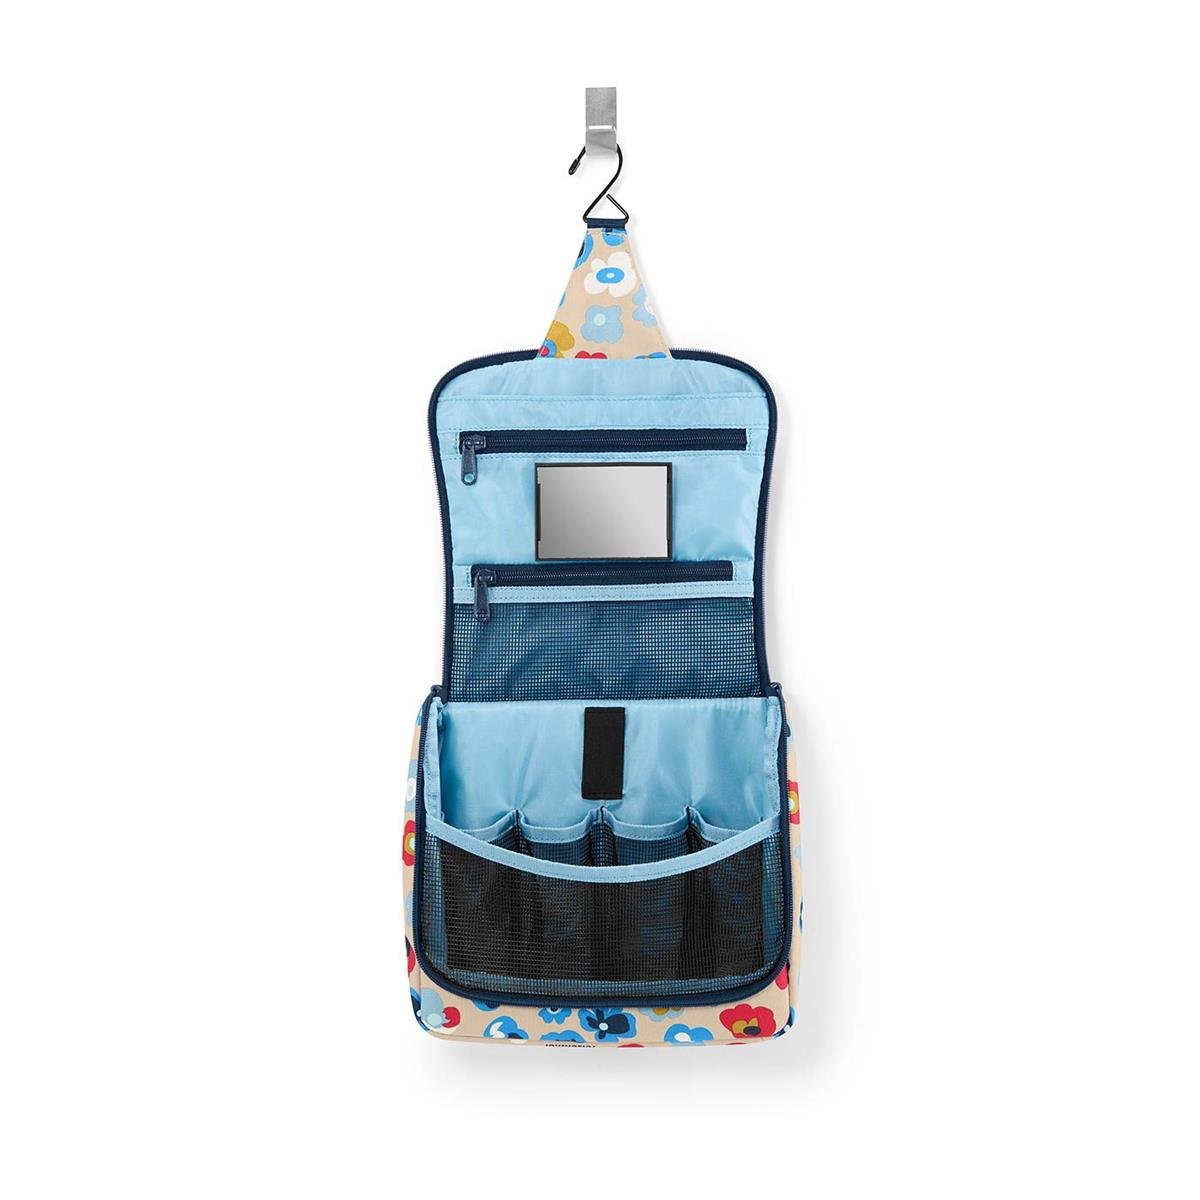 Reisenthel Toiletbag XL Trousse de Toilette 28 cm Bleu WO4050